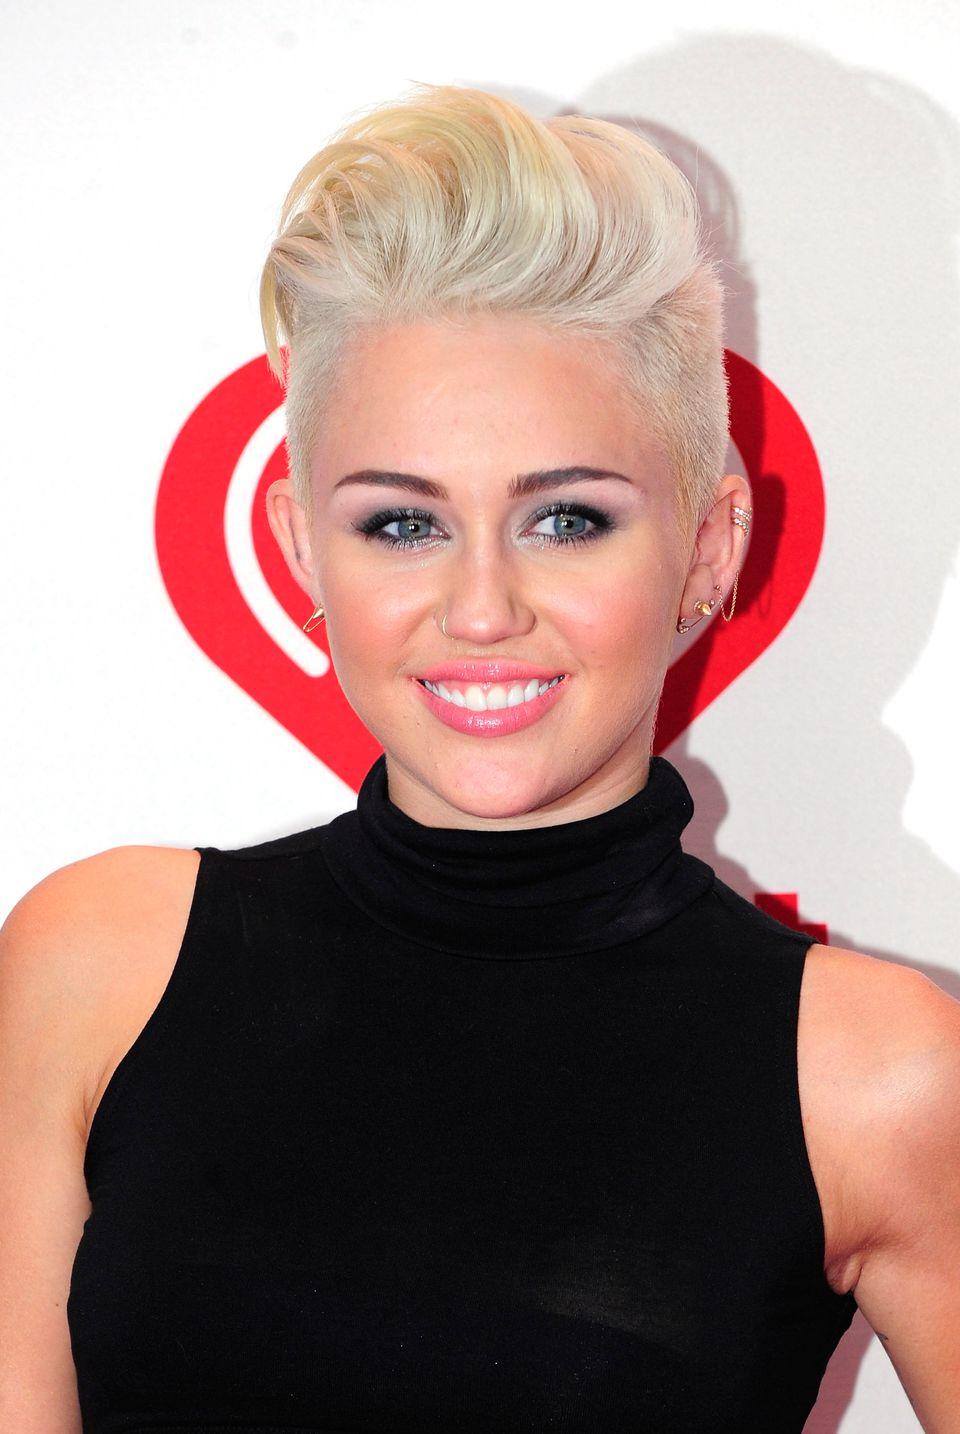 """Why did Miley Cyrus <a href=""https://www.huffpost.com/entry/miley-cyrus-cuts-her-hair-pixie-cut-blonde_n_2164400"">cut her ha"